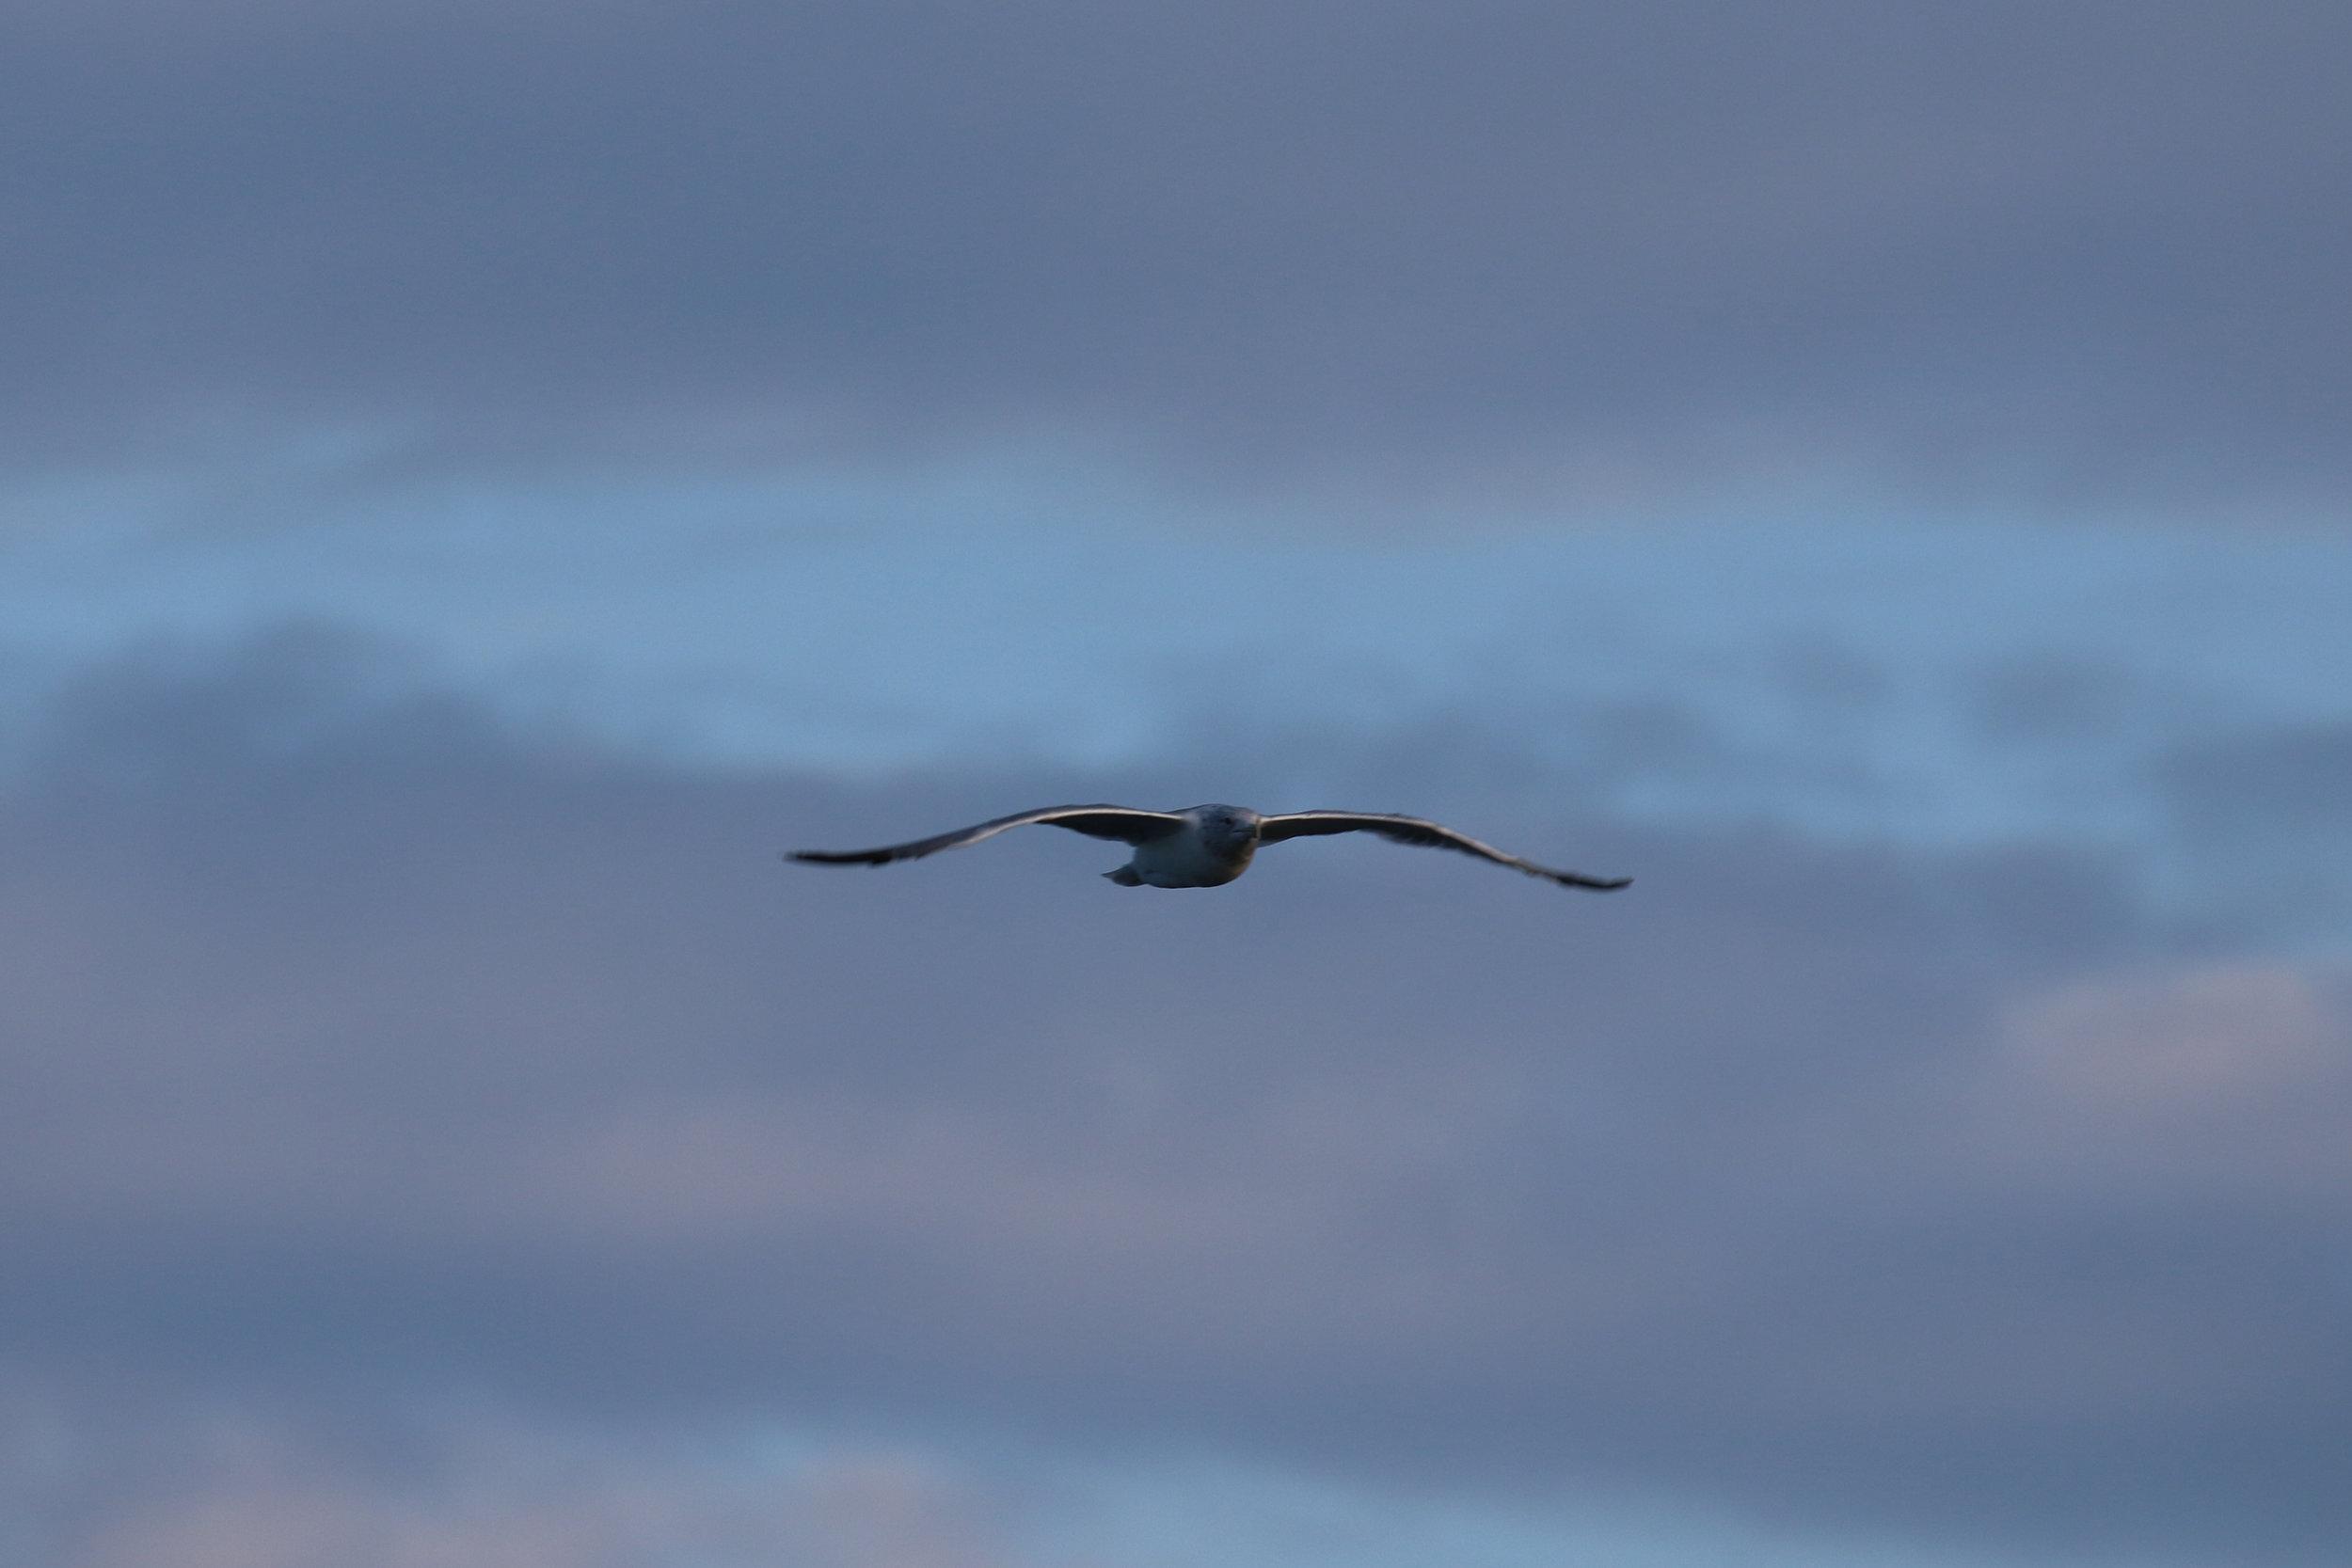 A gull enjoying the show as well.